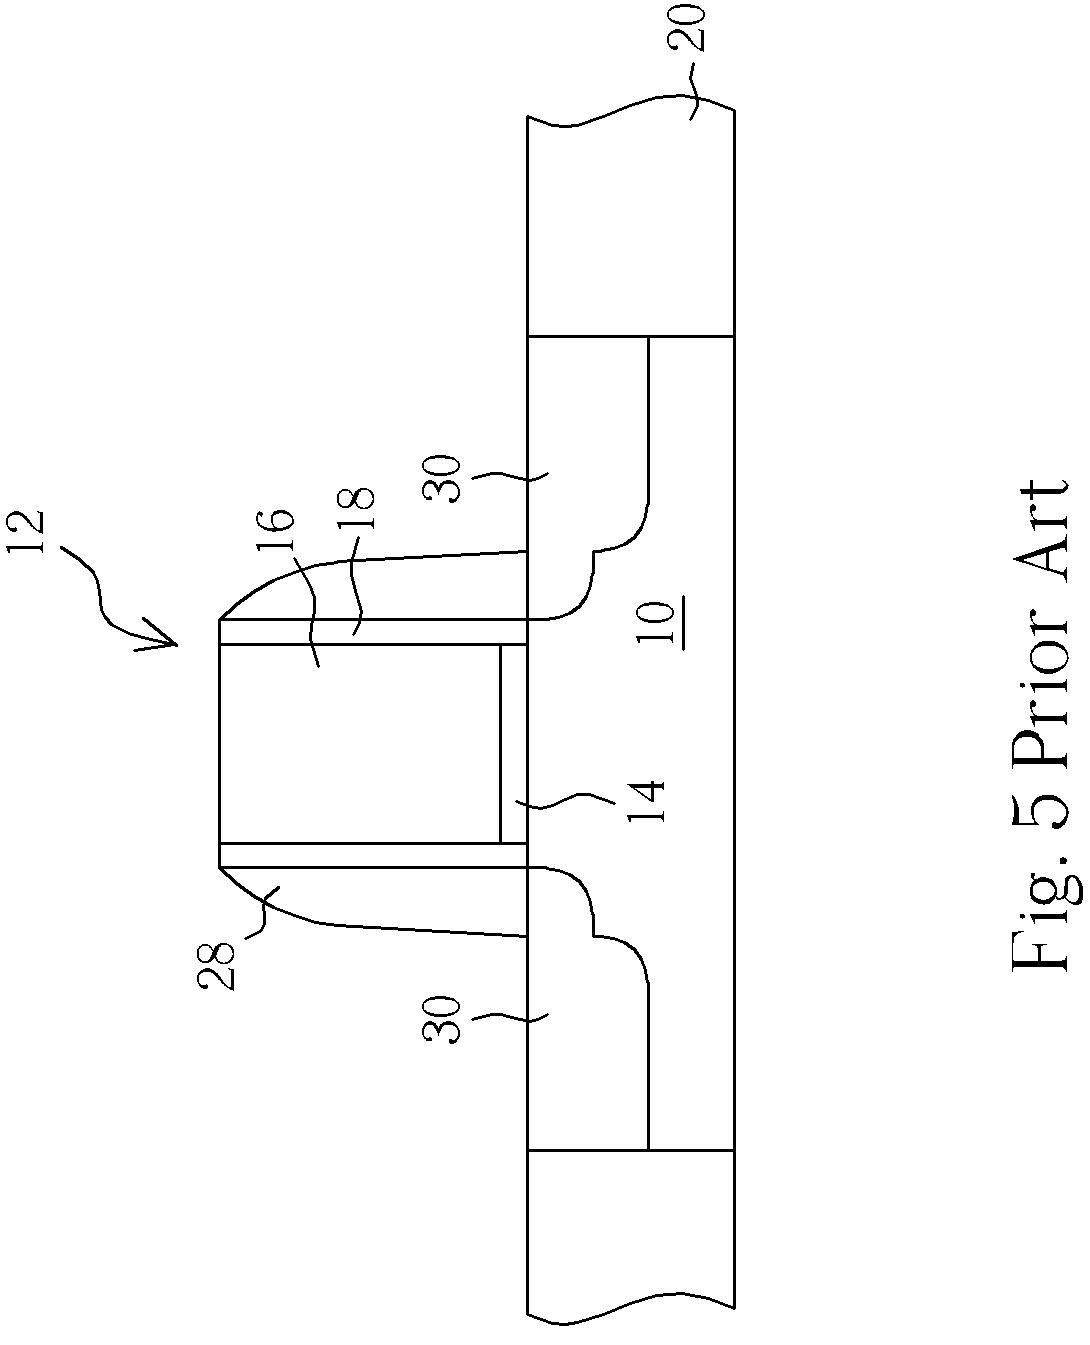 fabricating an nmos